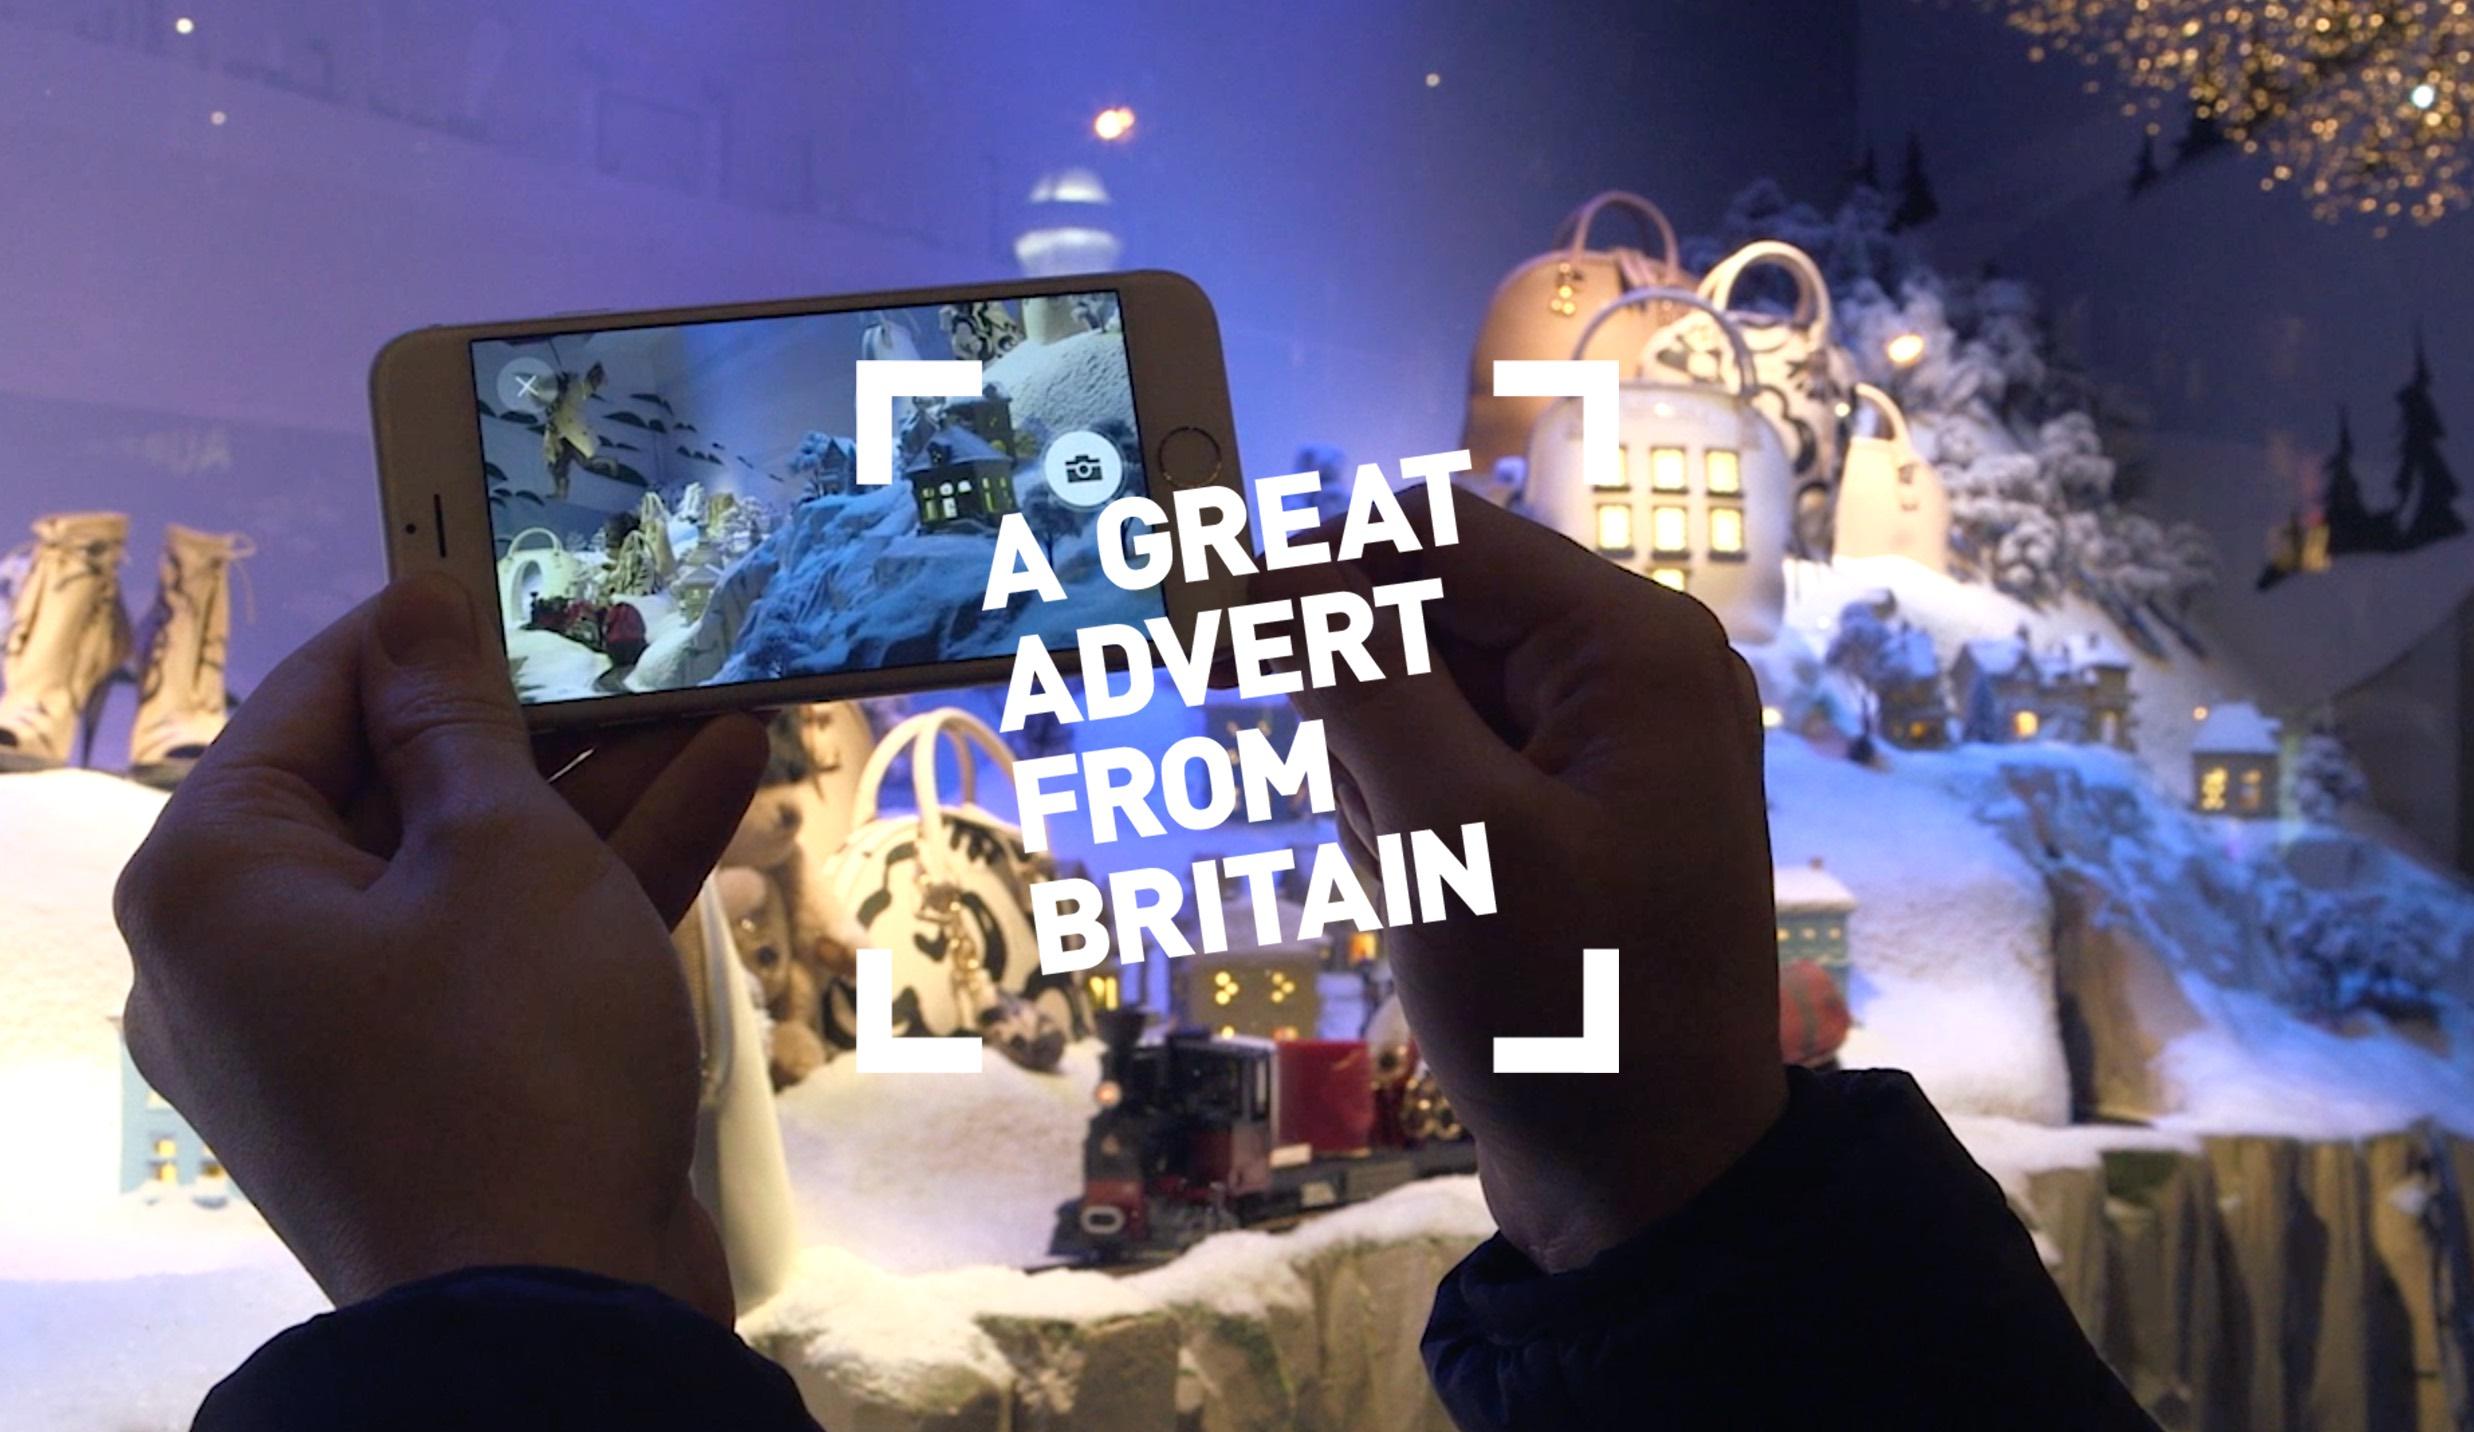 Promote UK, Advertising Association